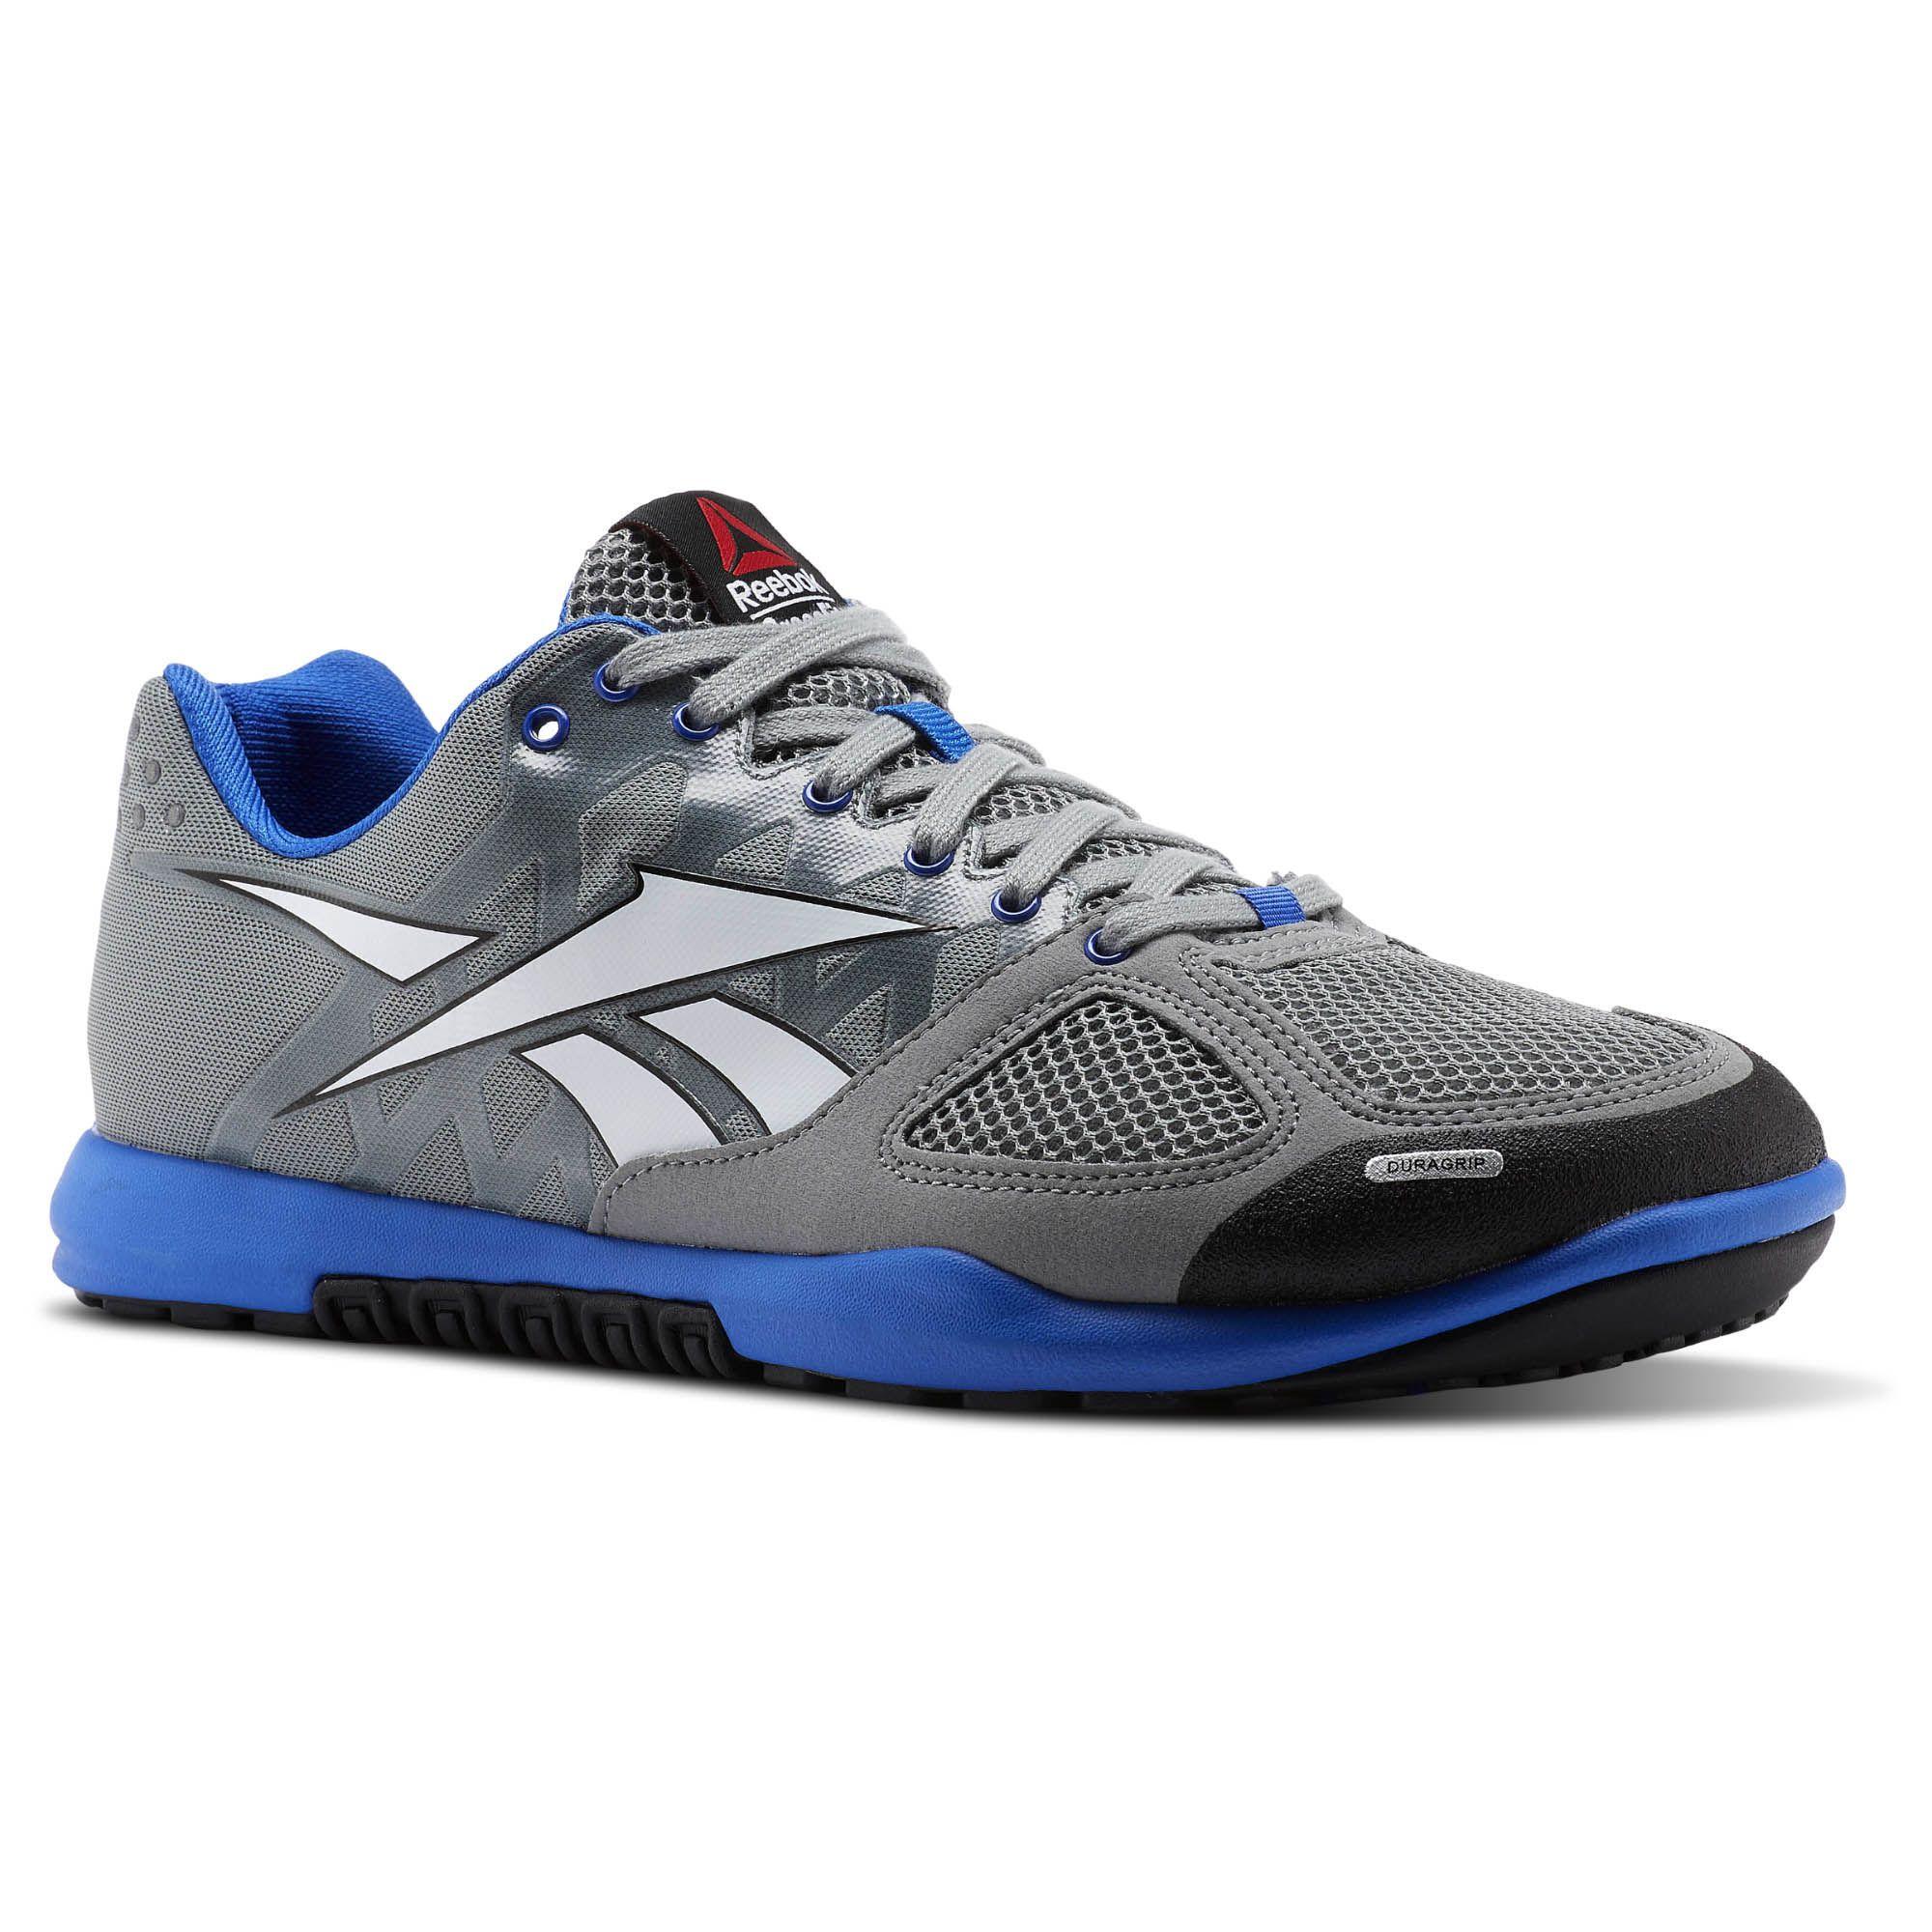 Oblea Simular traidor  Best Reebok CrossFit Nano 2.0 Shoes 2020 Review | Reebok crossfit nano,  Reebok crossfit, Mens crossfit shoes